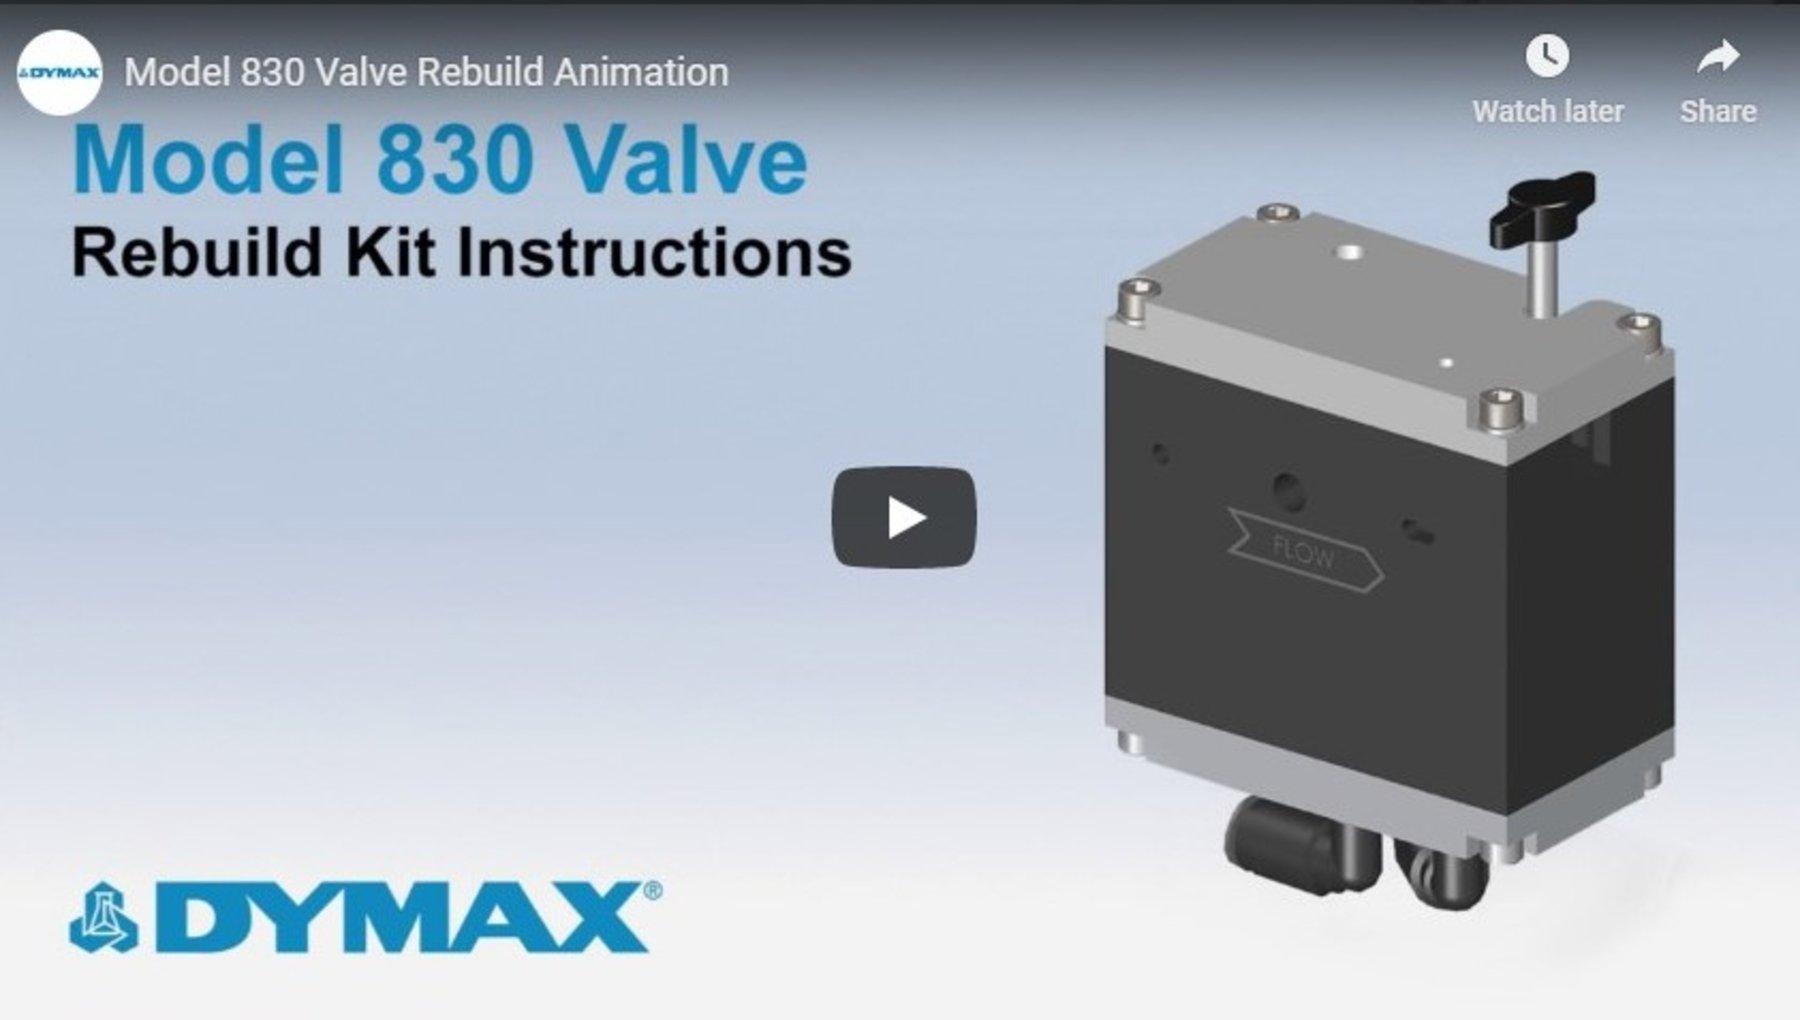 Model 830 Valve Rebuild Animation